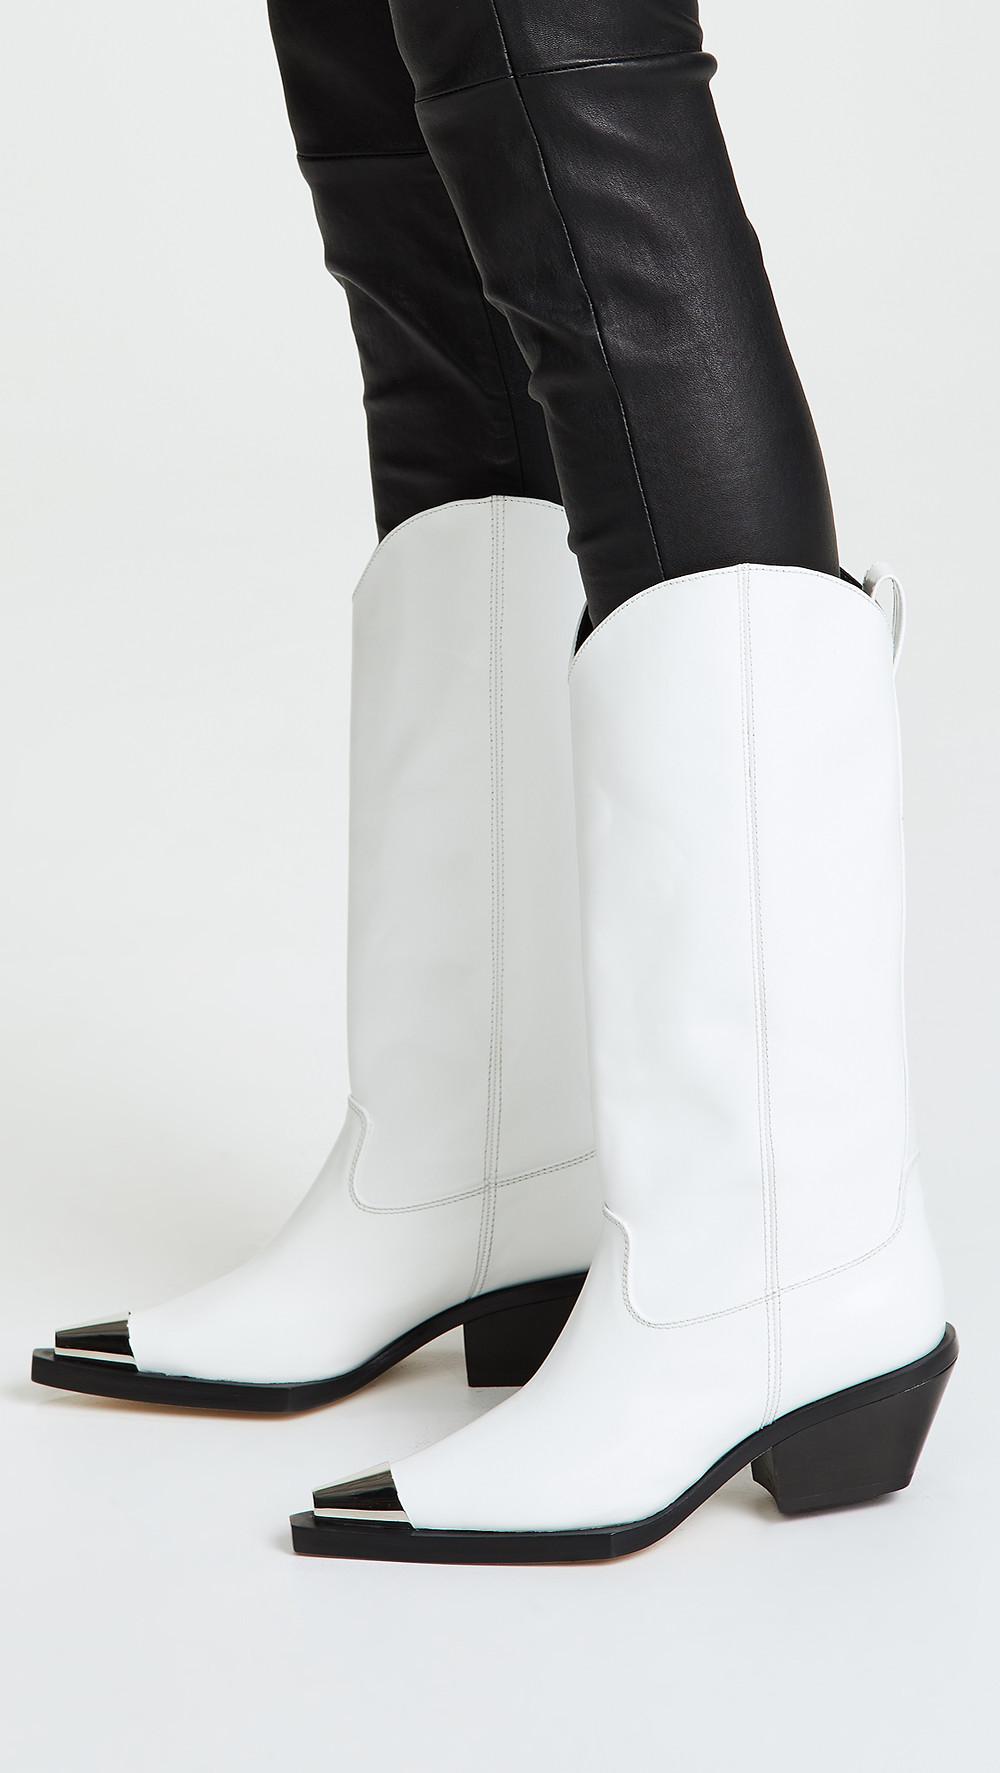 Helmut Lang Tall Cowboy Boots $895